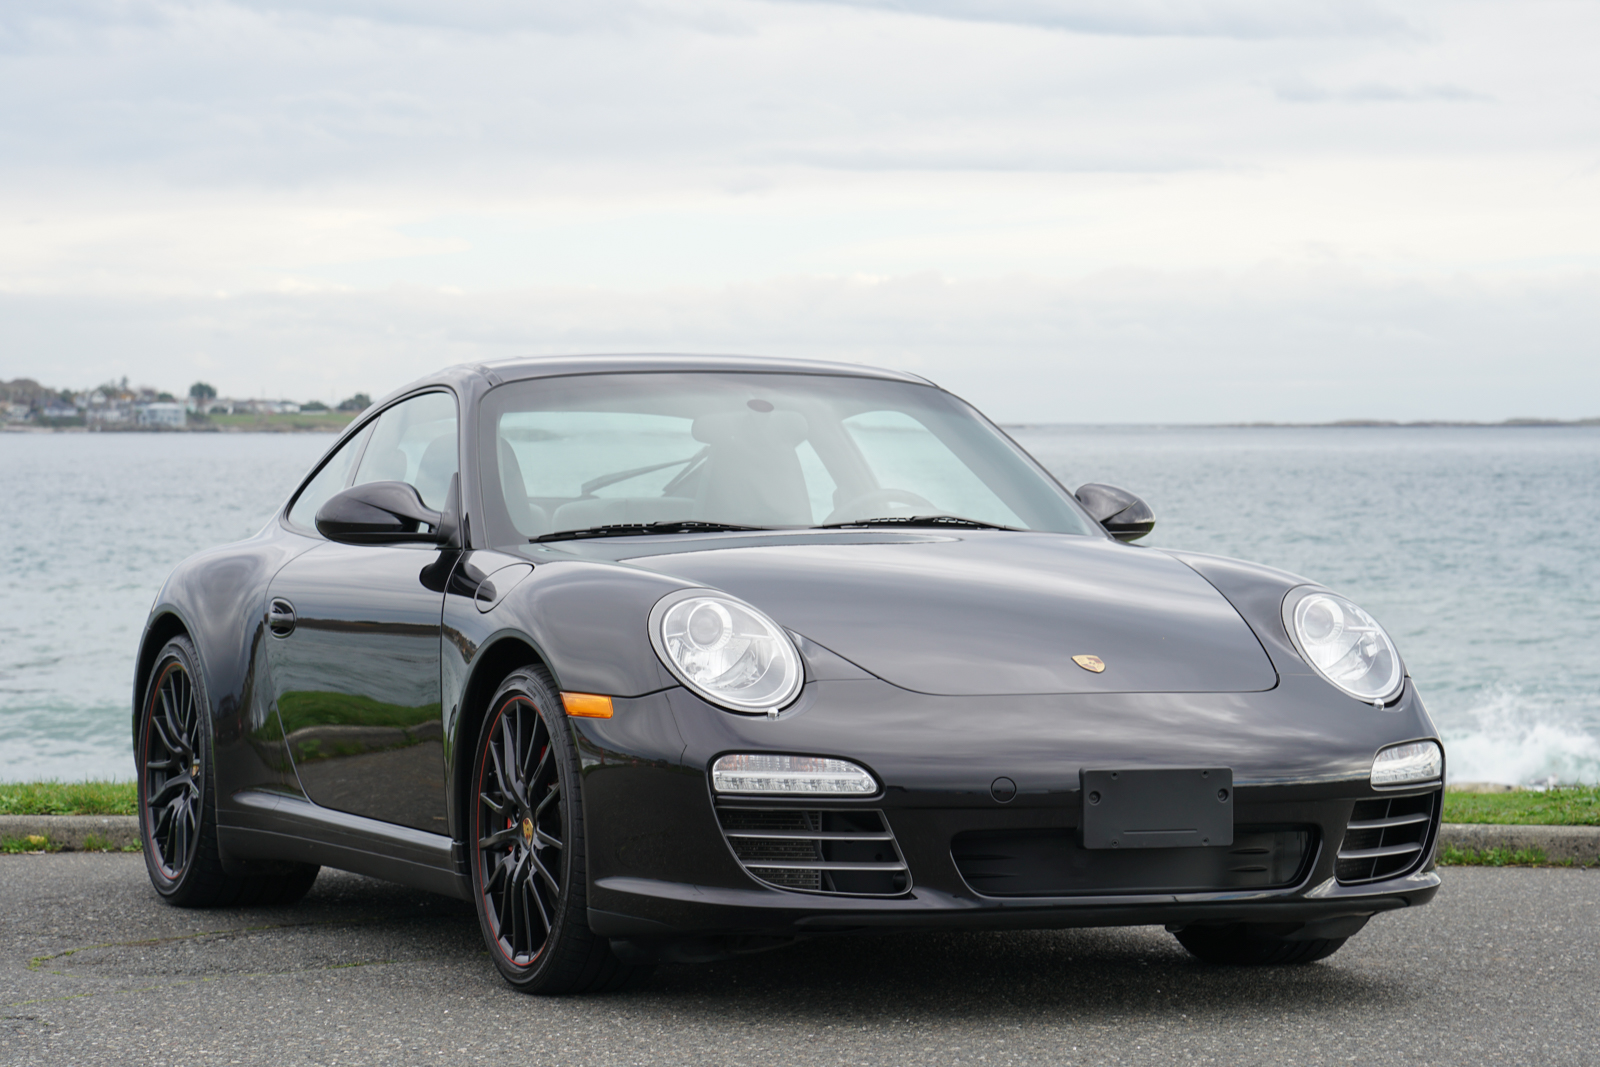 Worksheet. 2009 Porsche 911 Carrera 4s For Sale Silver Arrow Cars Ltd